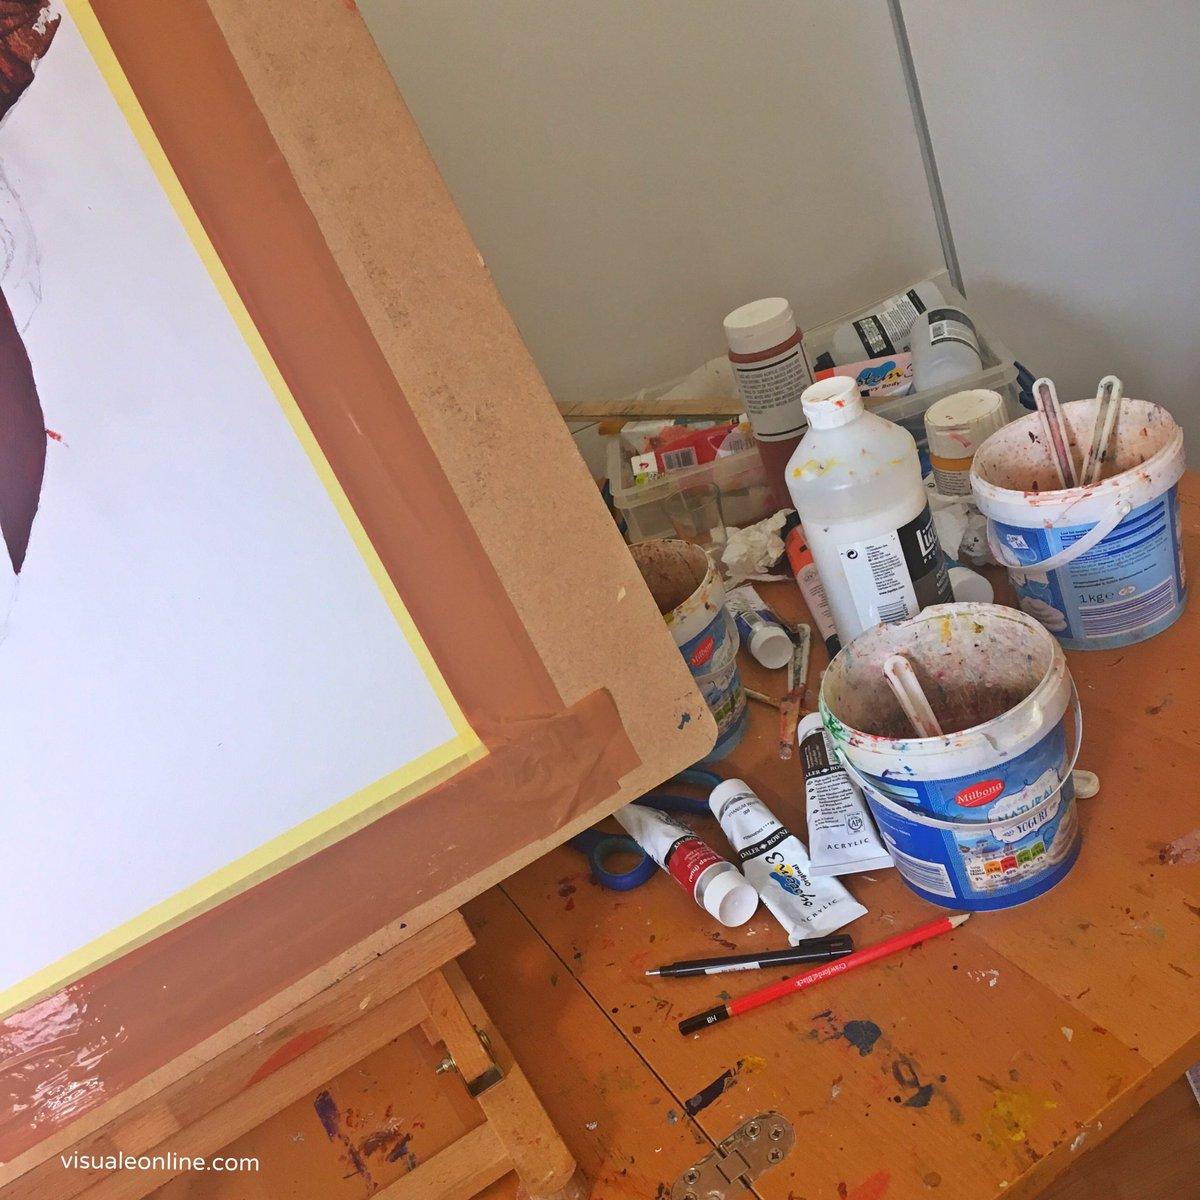 Exploring & creating new paintings.... #studiotime #artist #ideas #creativity #stayathome #painting #deemanningpic.twitter.com/ex5AGZzI27